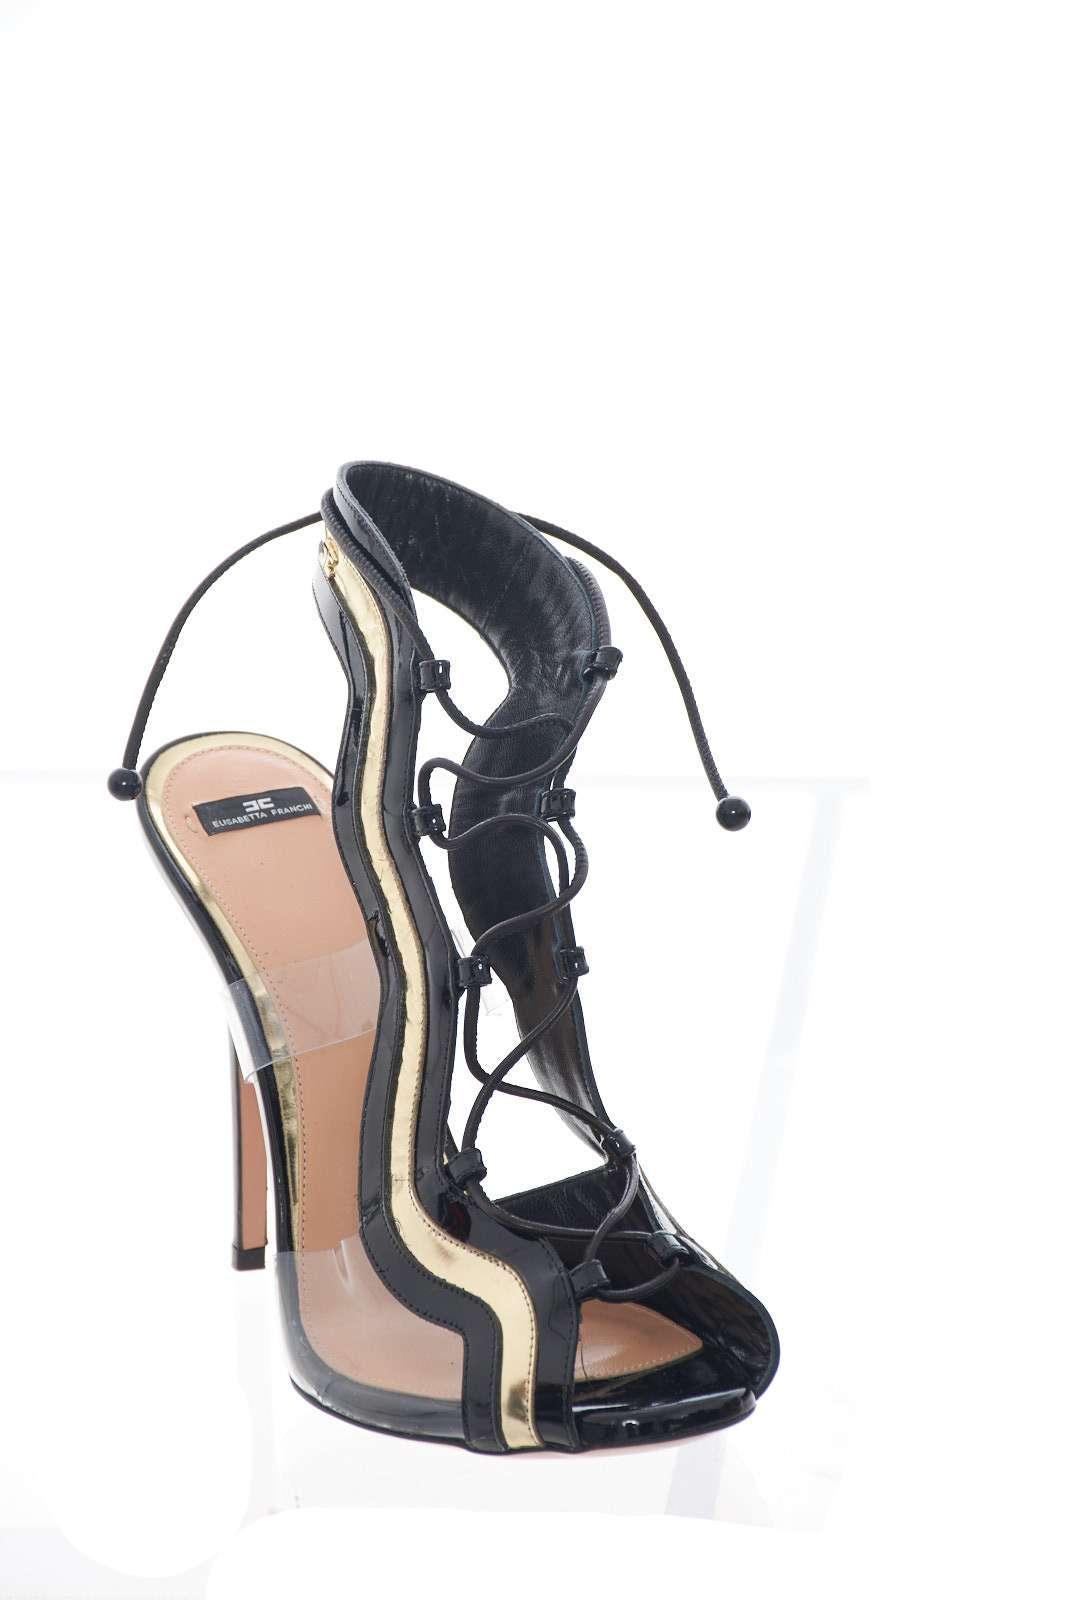 https://www.parmax.com/media/catalog/product/a/i/PE-outlet_parmax-scarpe-donna-Elisabetta-Franchi-SA36S92E2-C.jpg